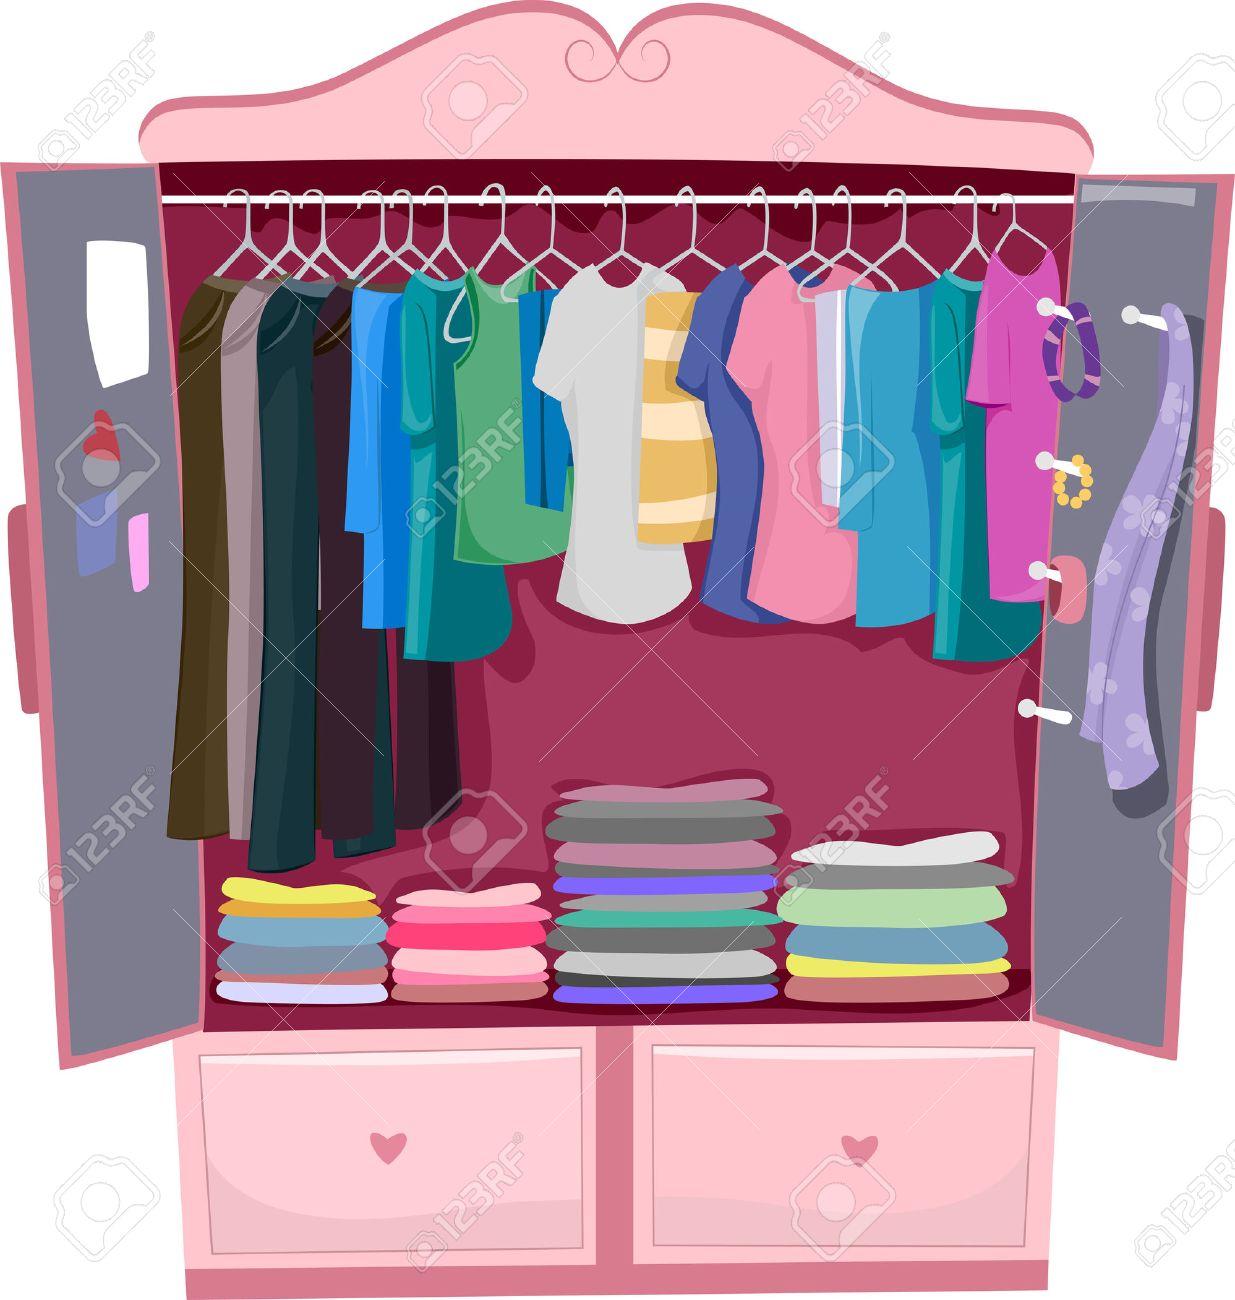 Clothes In Closet Clipart.